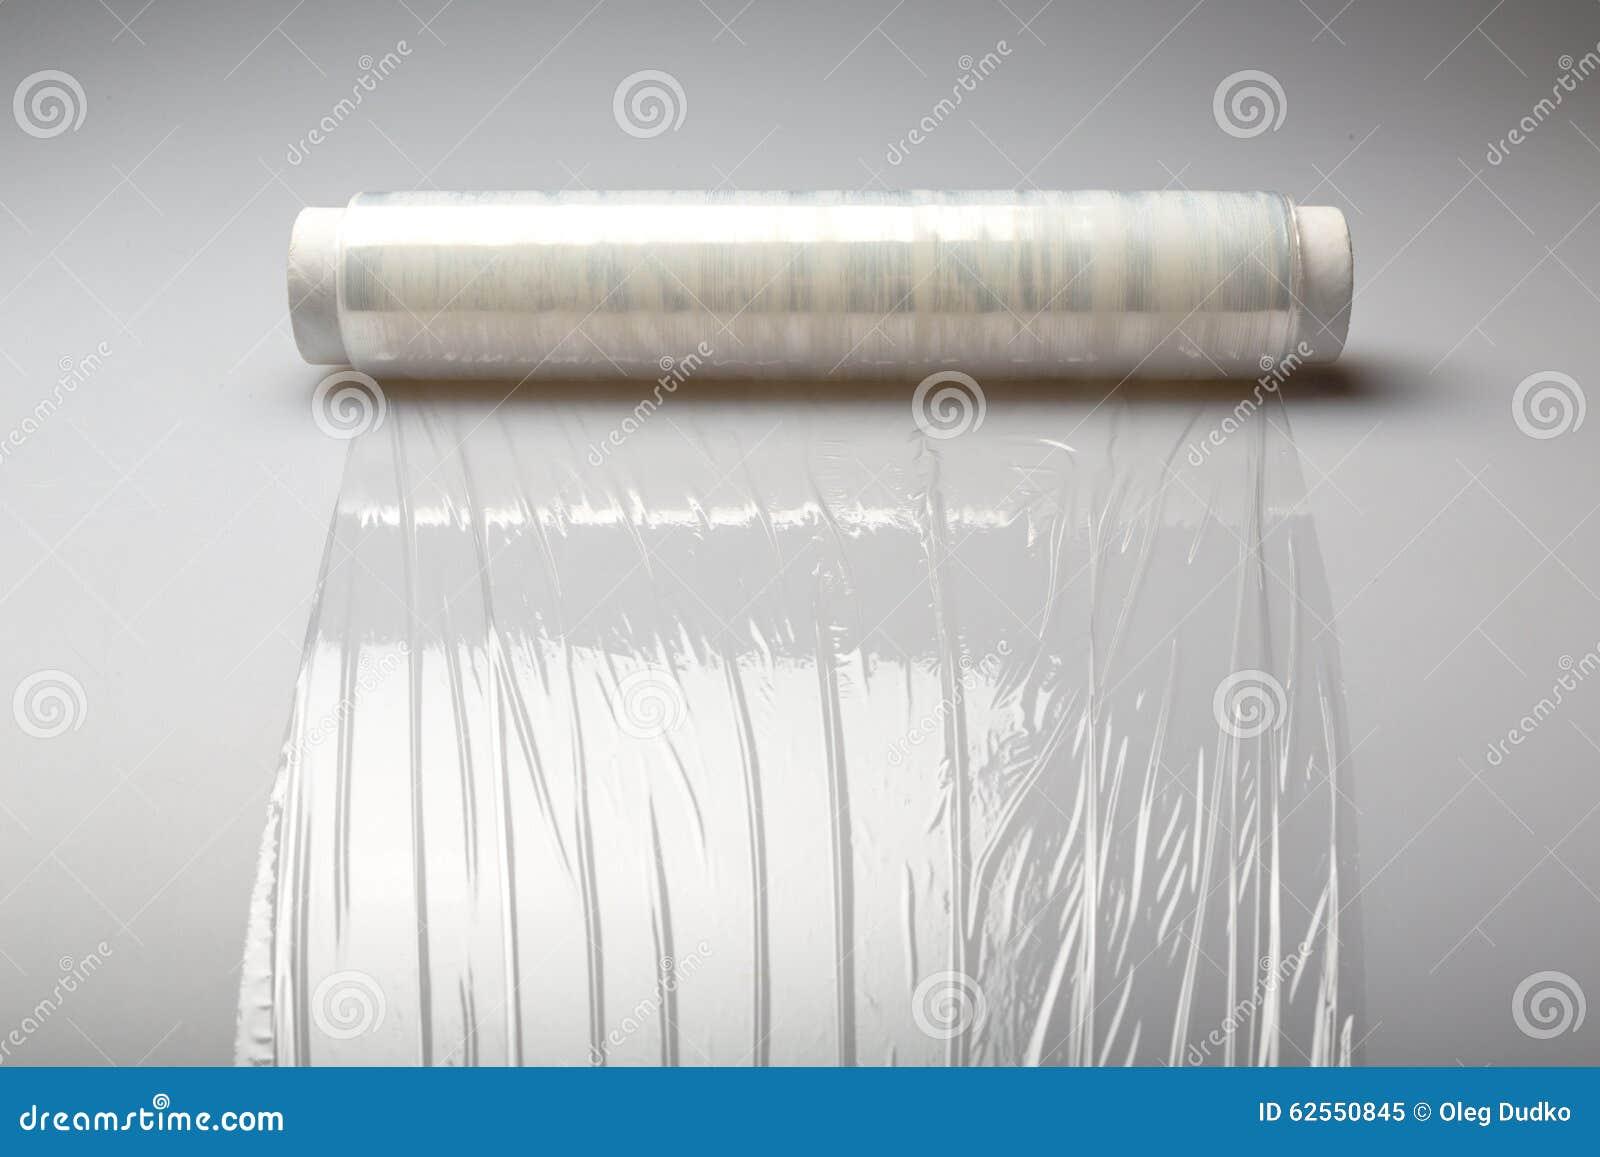 Plastic stock image  Image of white, adhesive, foil, equipment